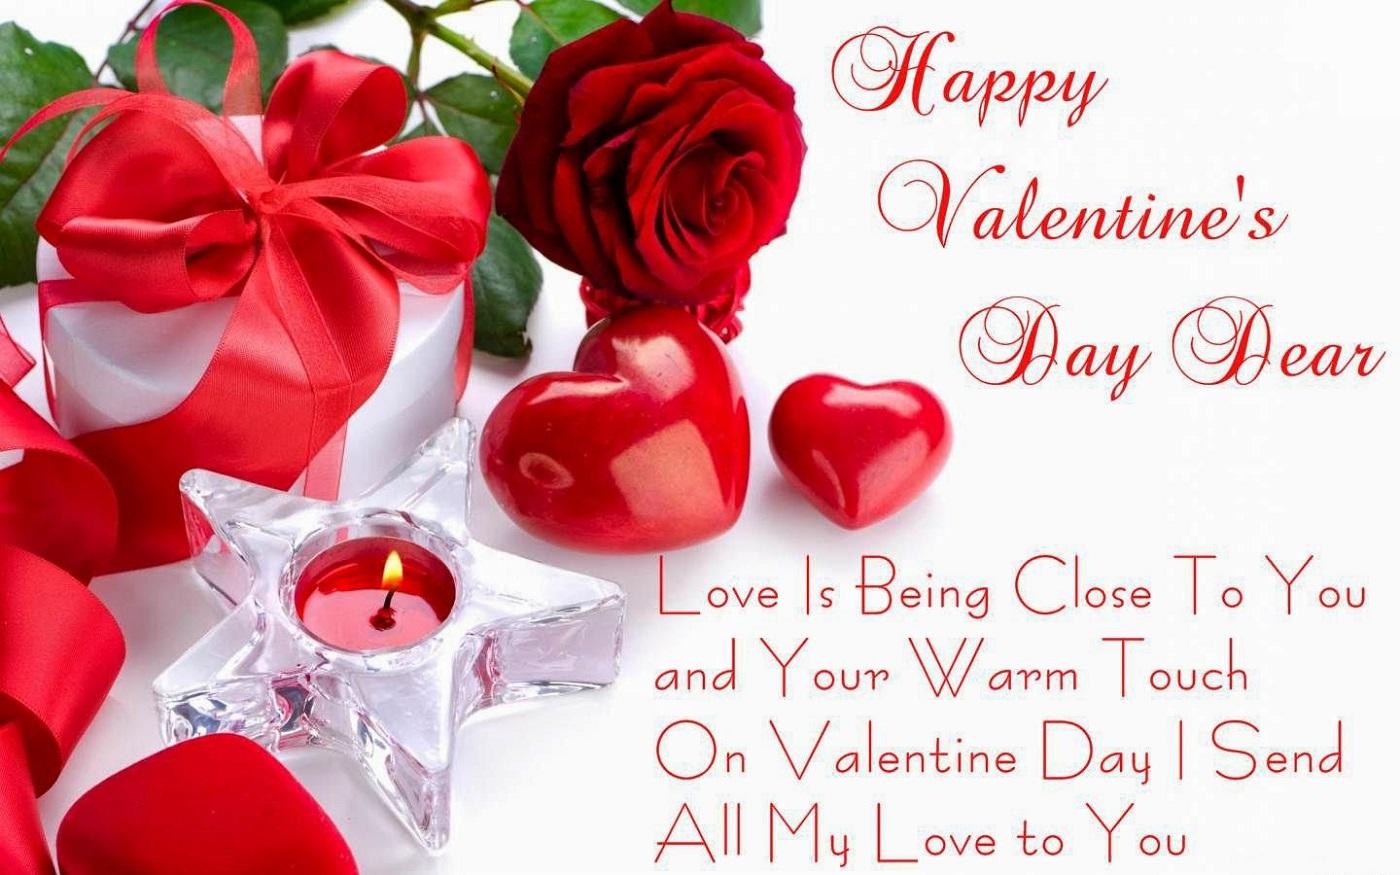 happy valentines day 2018 whatsapp status